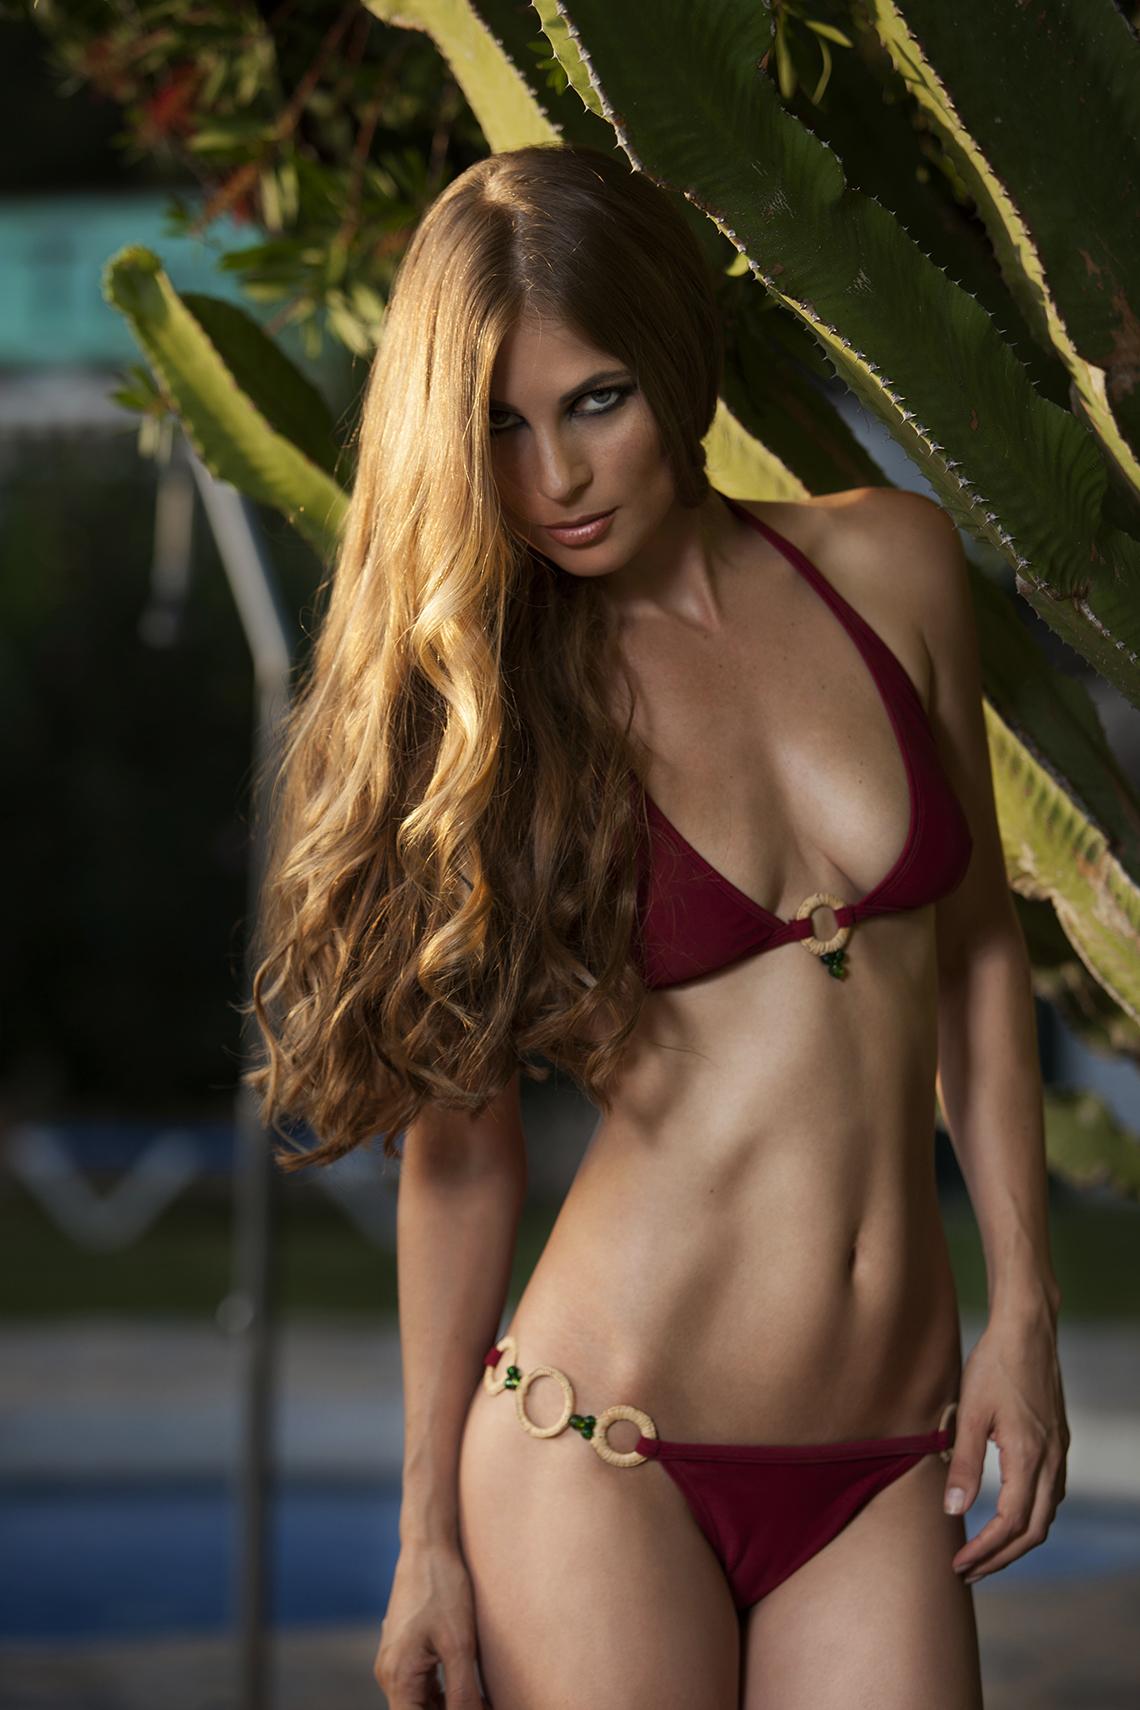 w-_MG_6546_final-1-fotografo-marbella-beauty